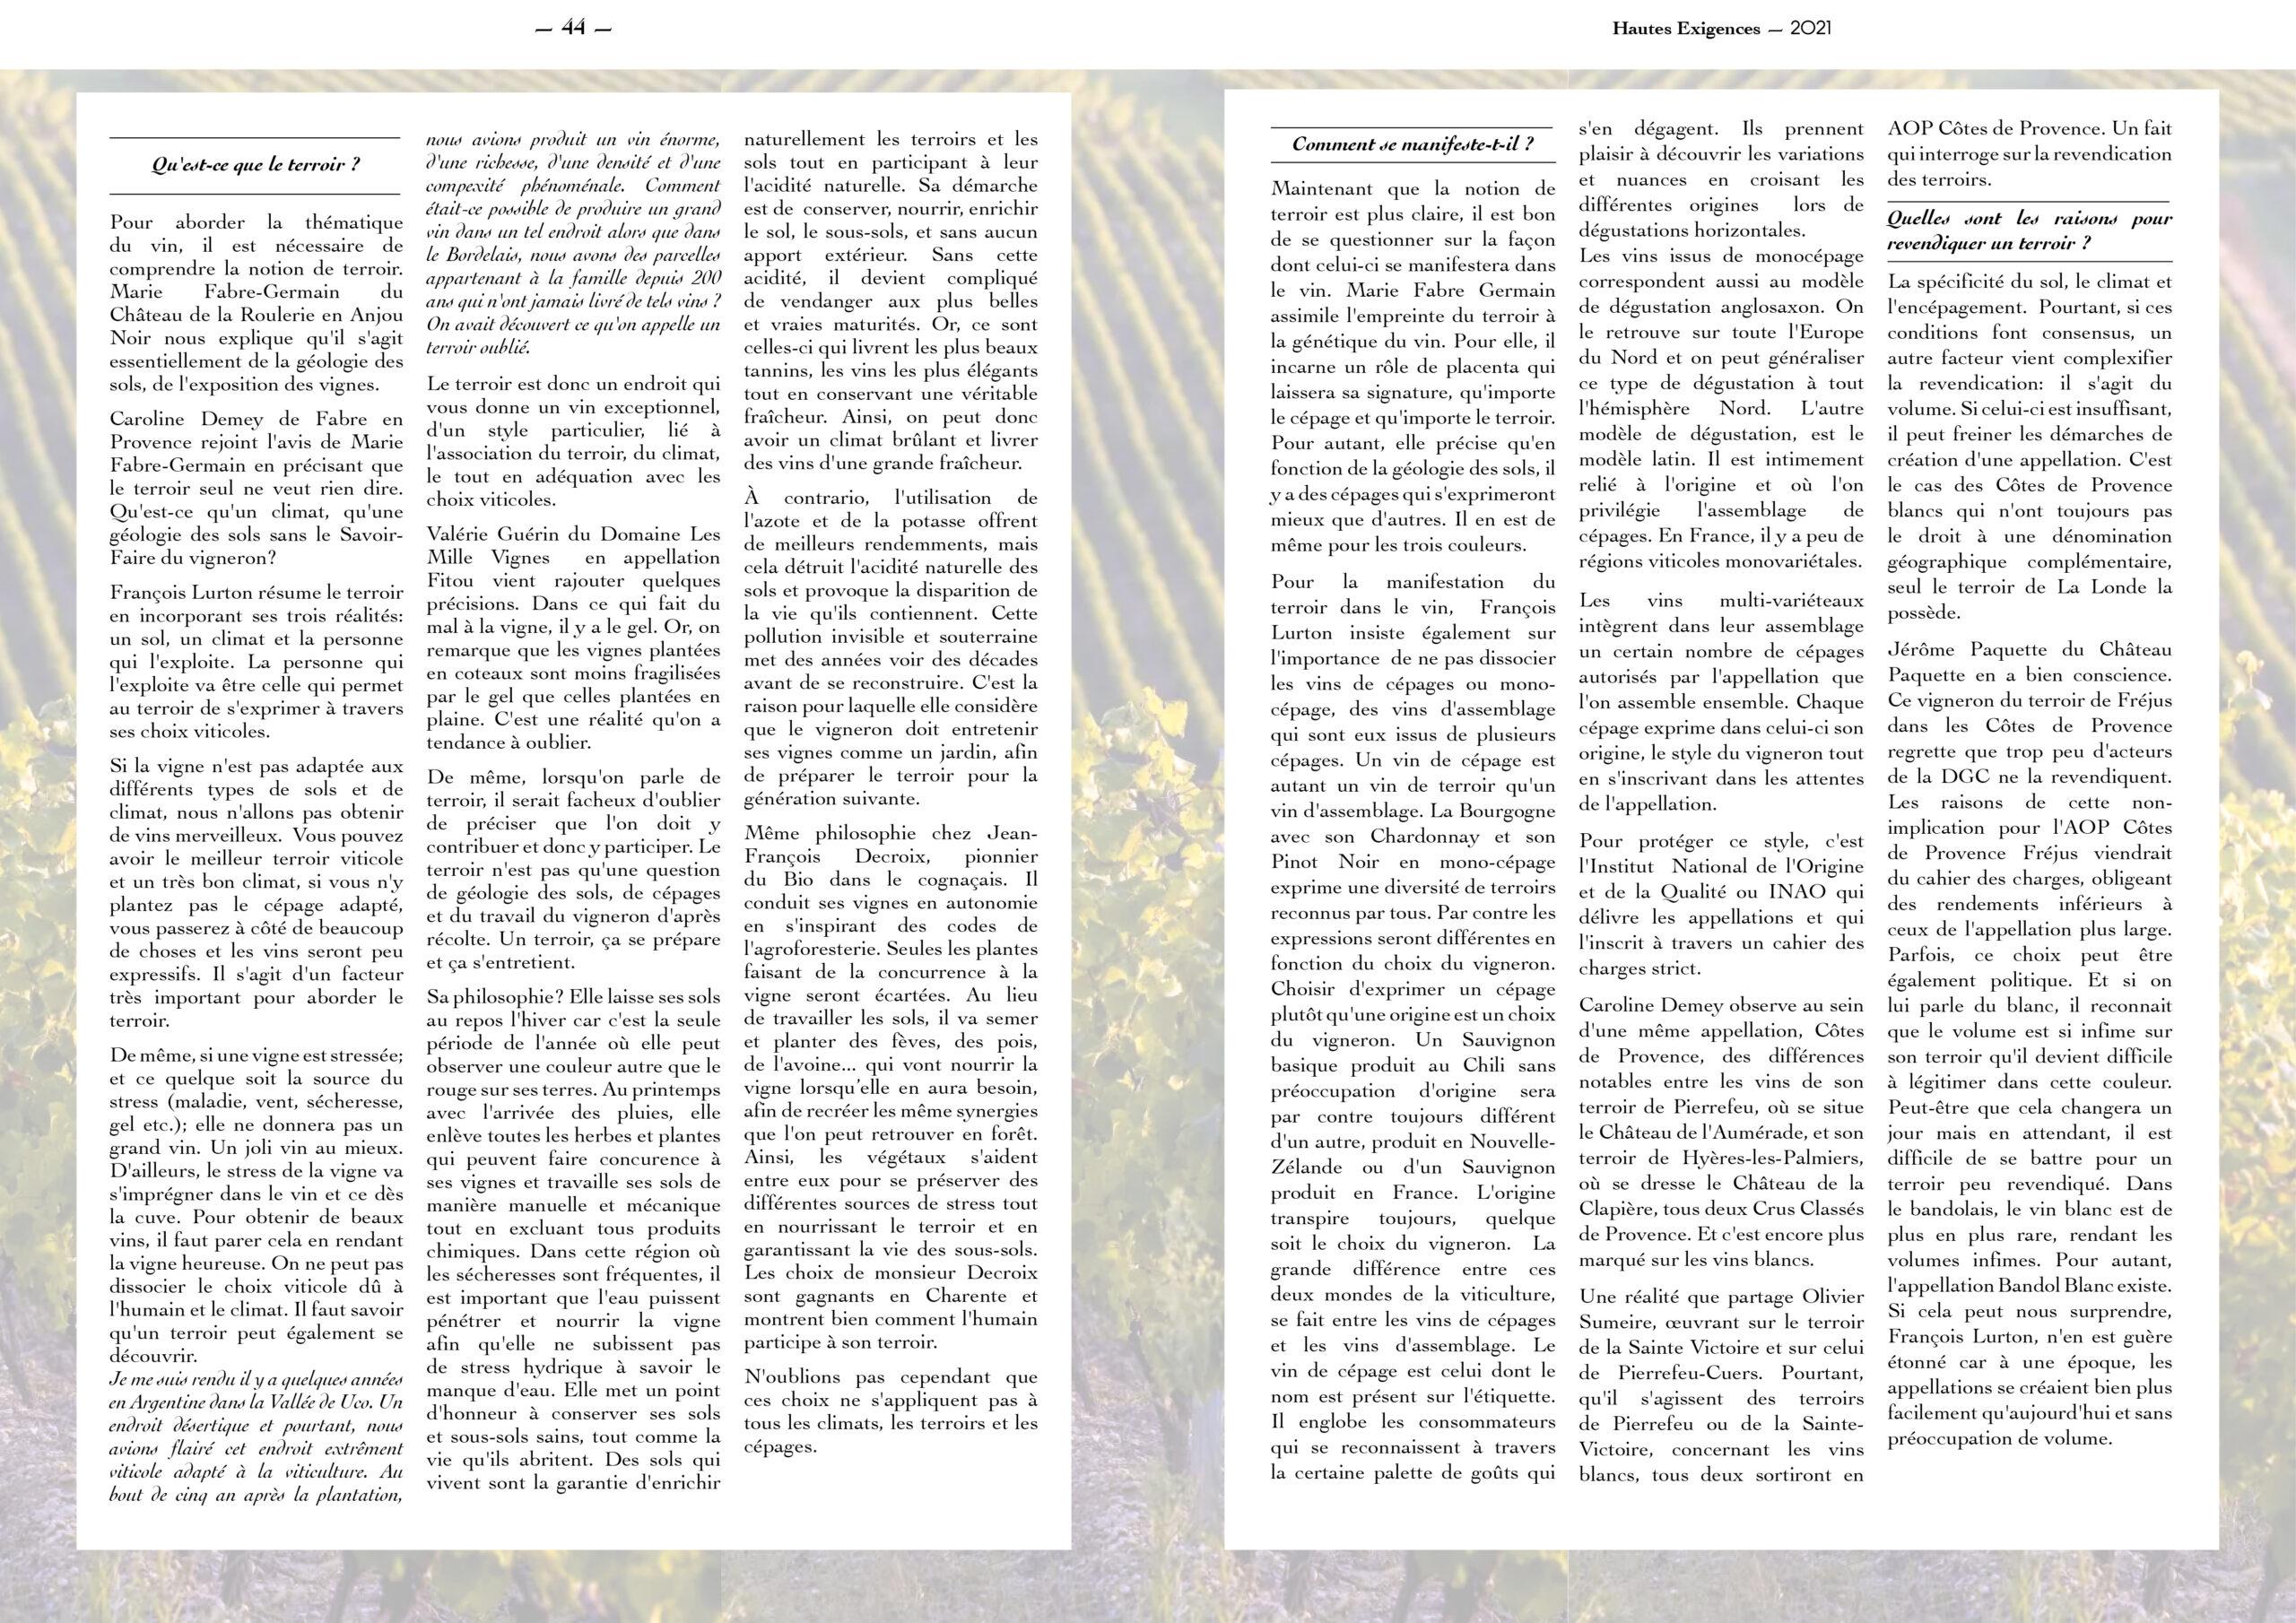 Hautes Exigences Magazine Hors Serie 2021 page 44-45